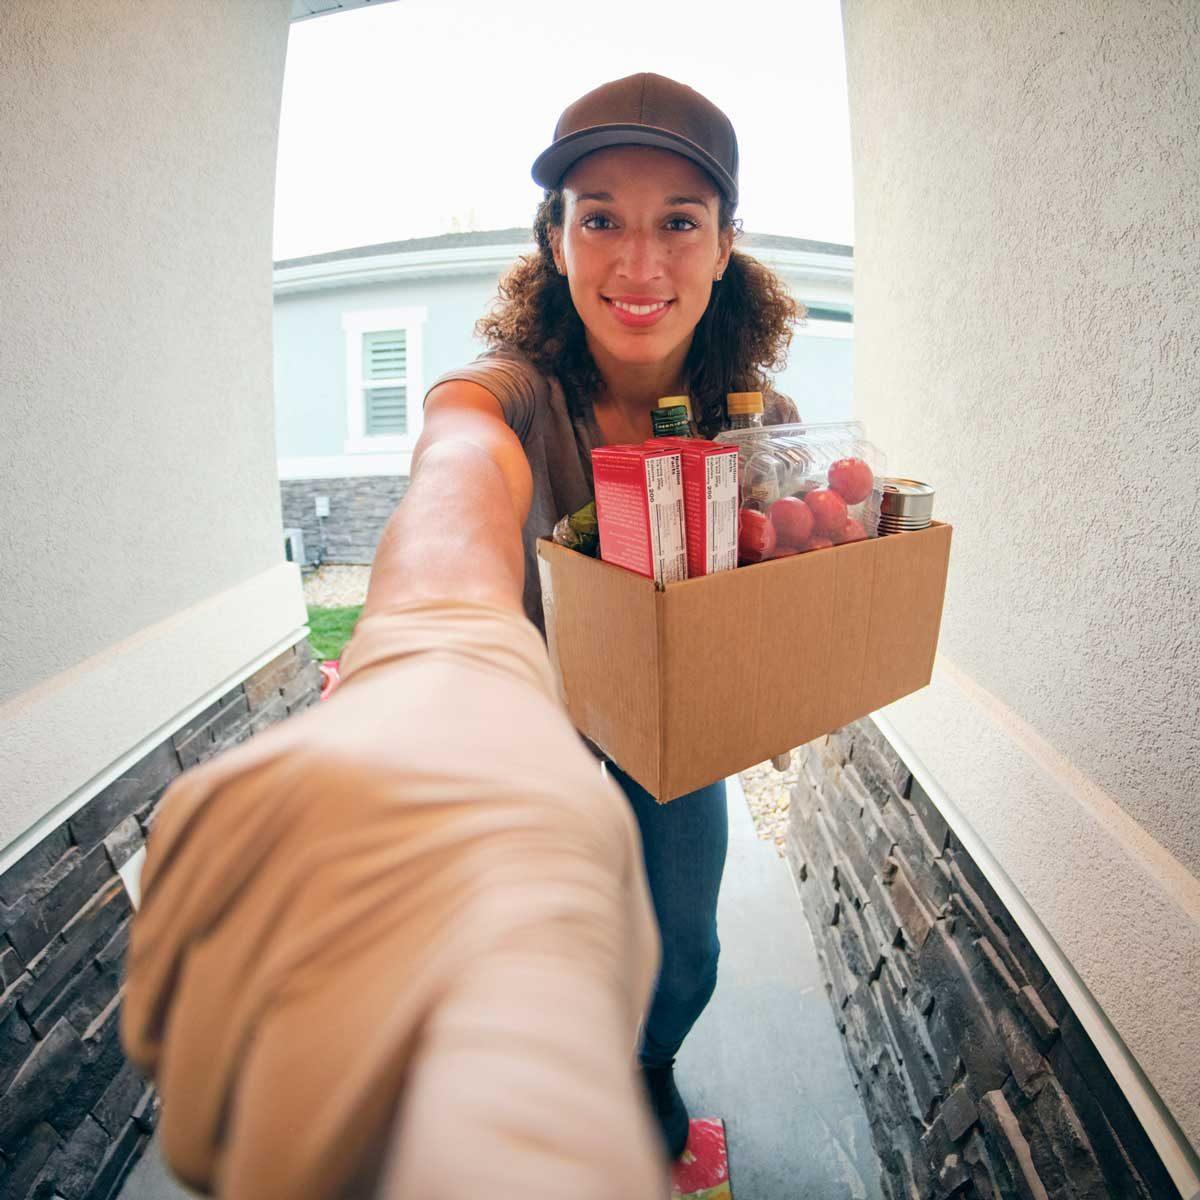 Woman ringing a doorbell